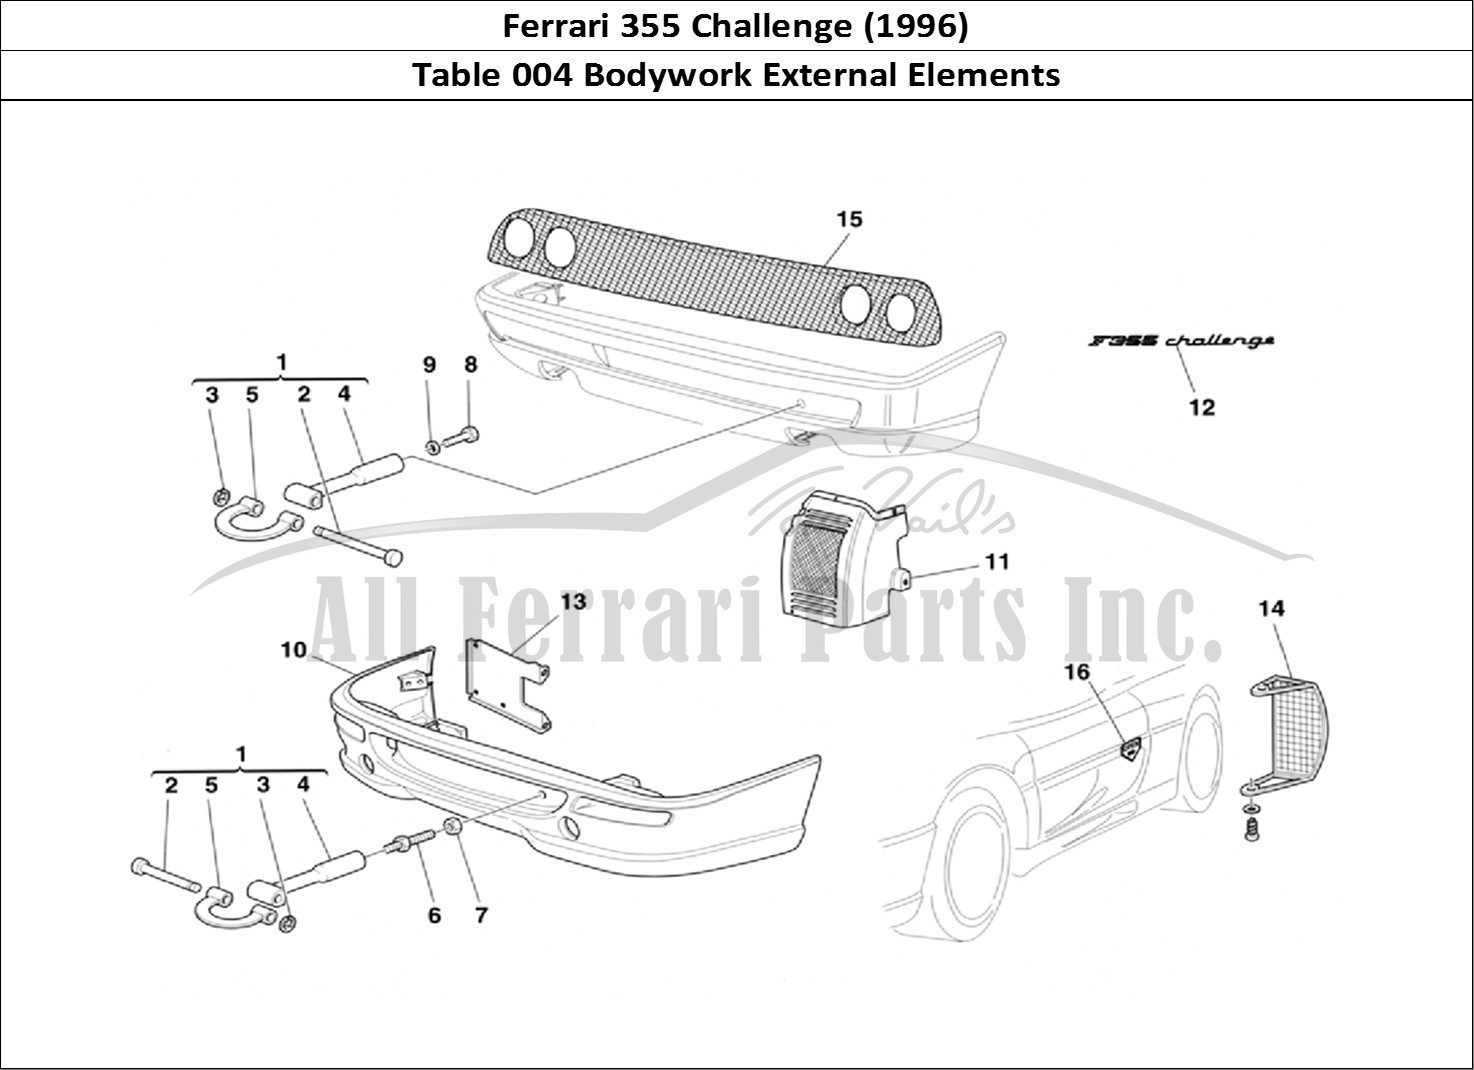 Buy original Ferrari 355 Challenge (1996) 004 Bodywork